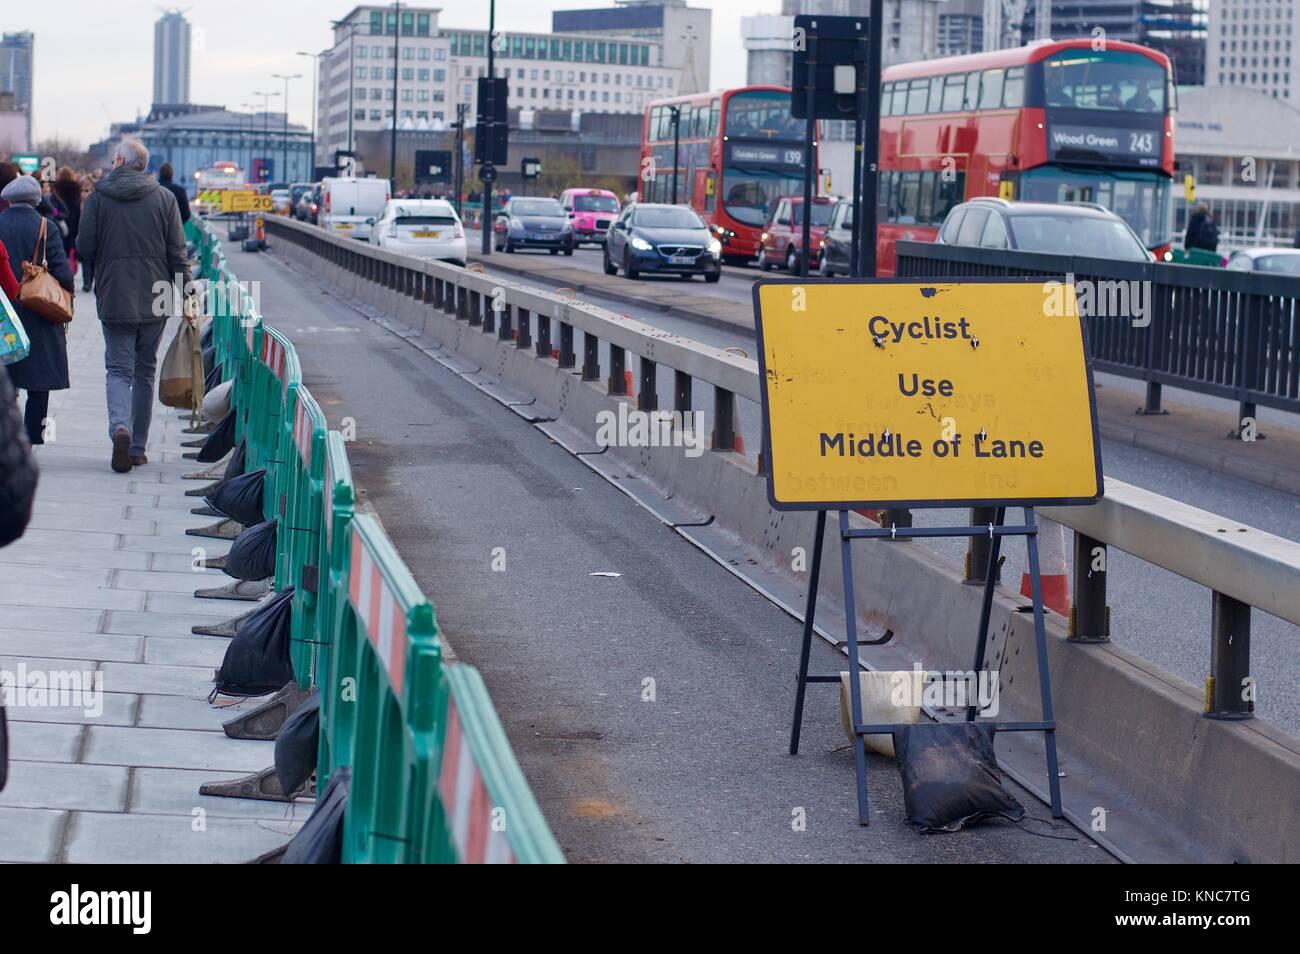 Anti-vehicle barriers on pavement of Waterloo Bridge installed after terror attack at London Bridge, London, UK - Stock Image